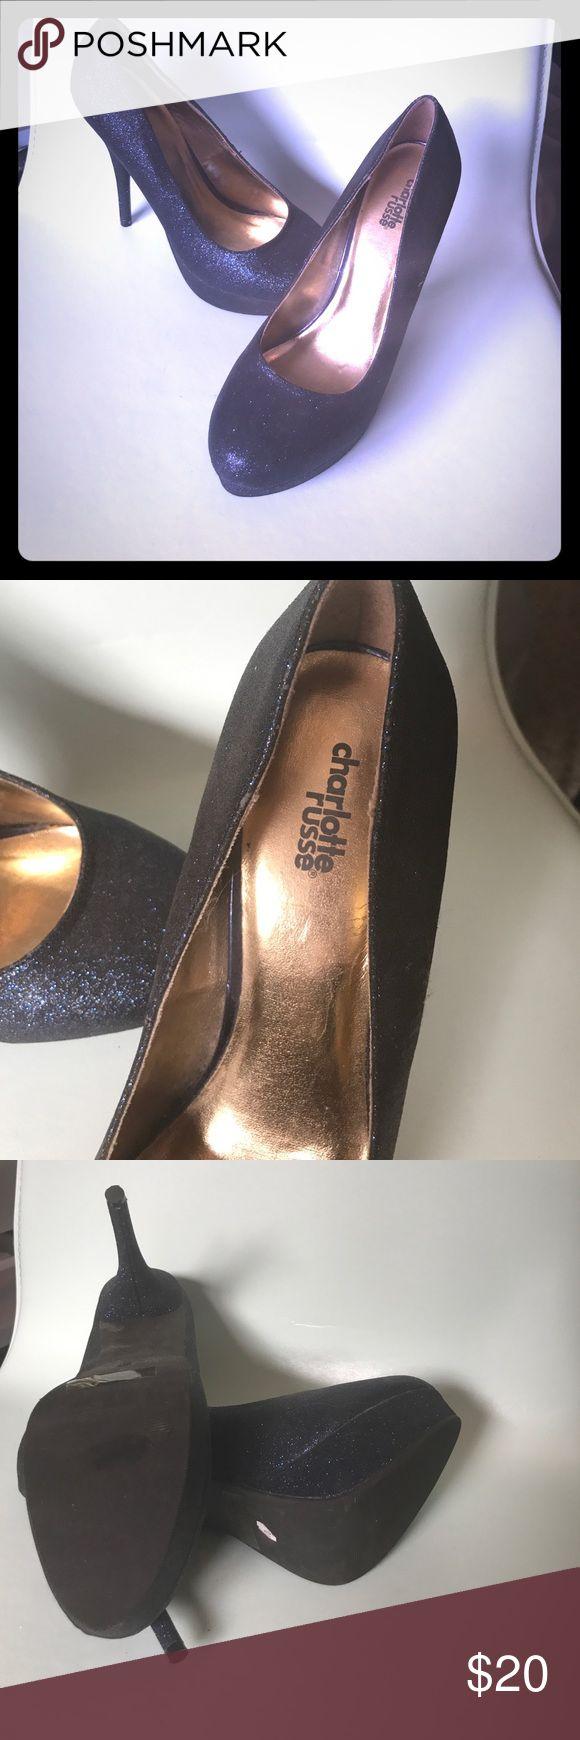 Charlotte Russe blue sparkle high heels Amazing navy sparkle Charlotte Russe 5 inch high heels in excellent condition! Charlotte Russe Shoes Heels